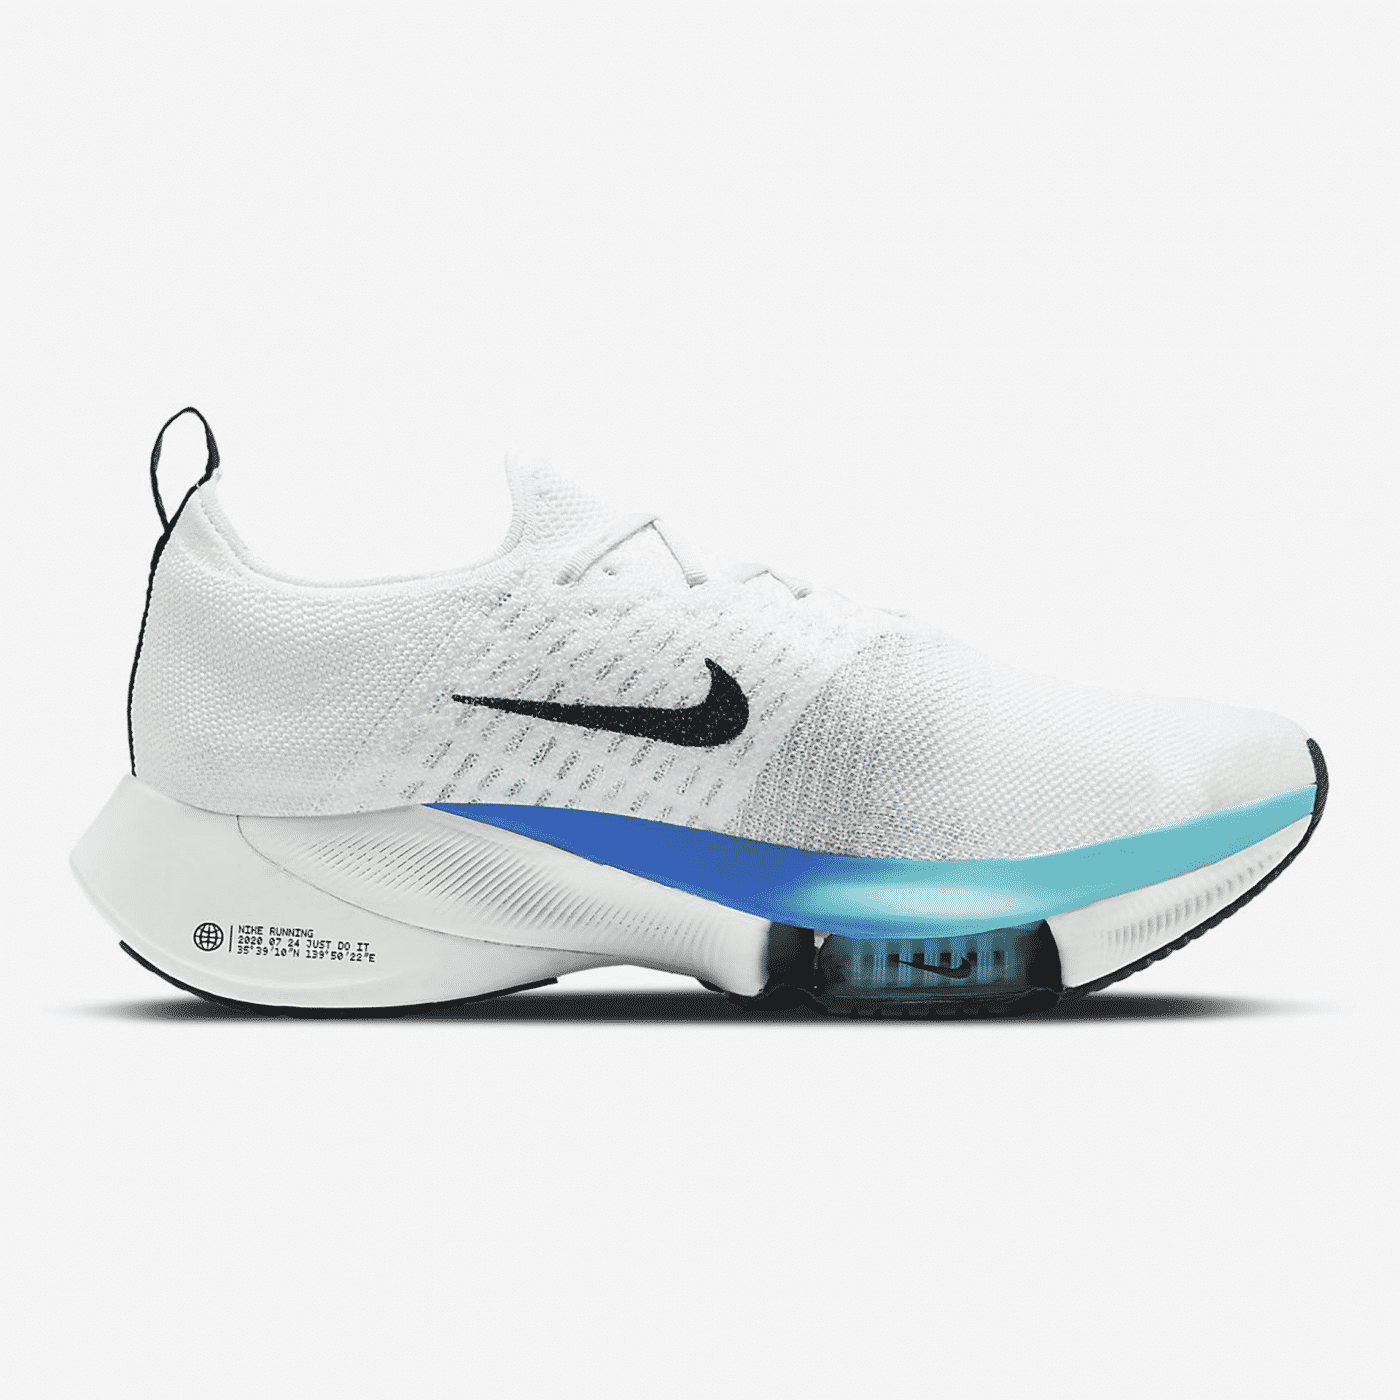 Nike-air-zoom-tempo-next-3